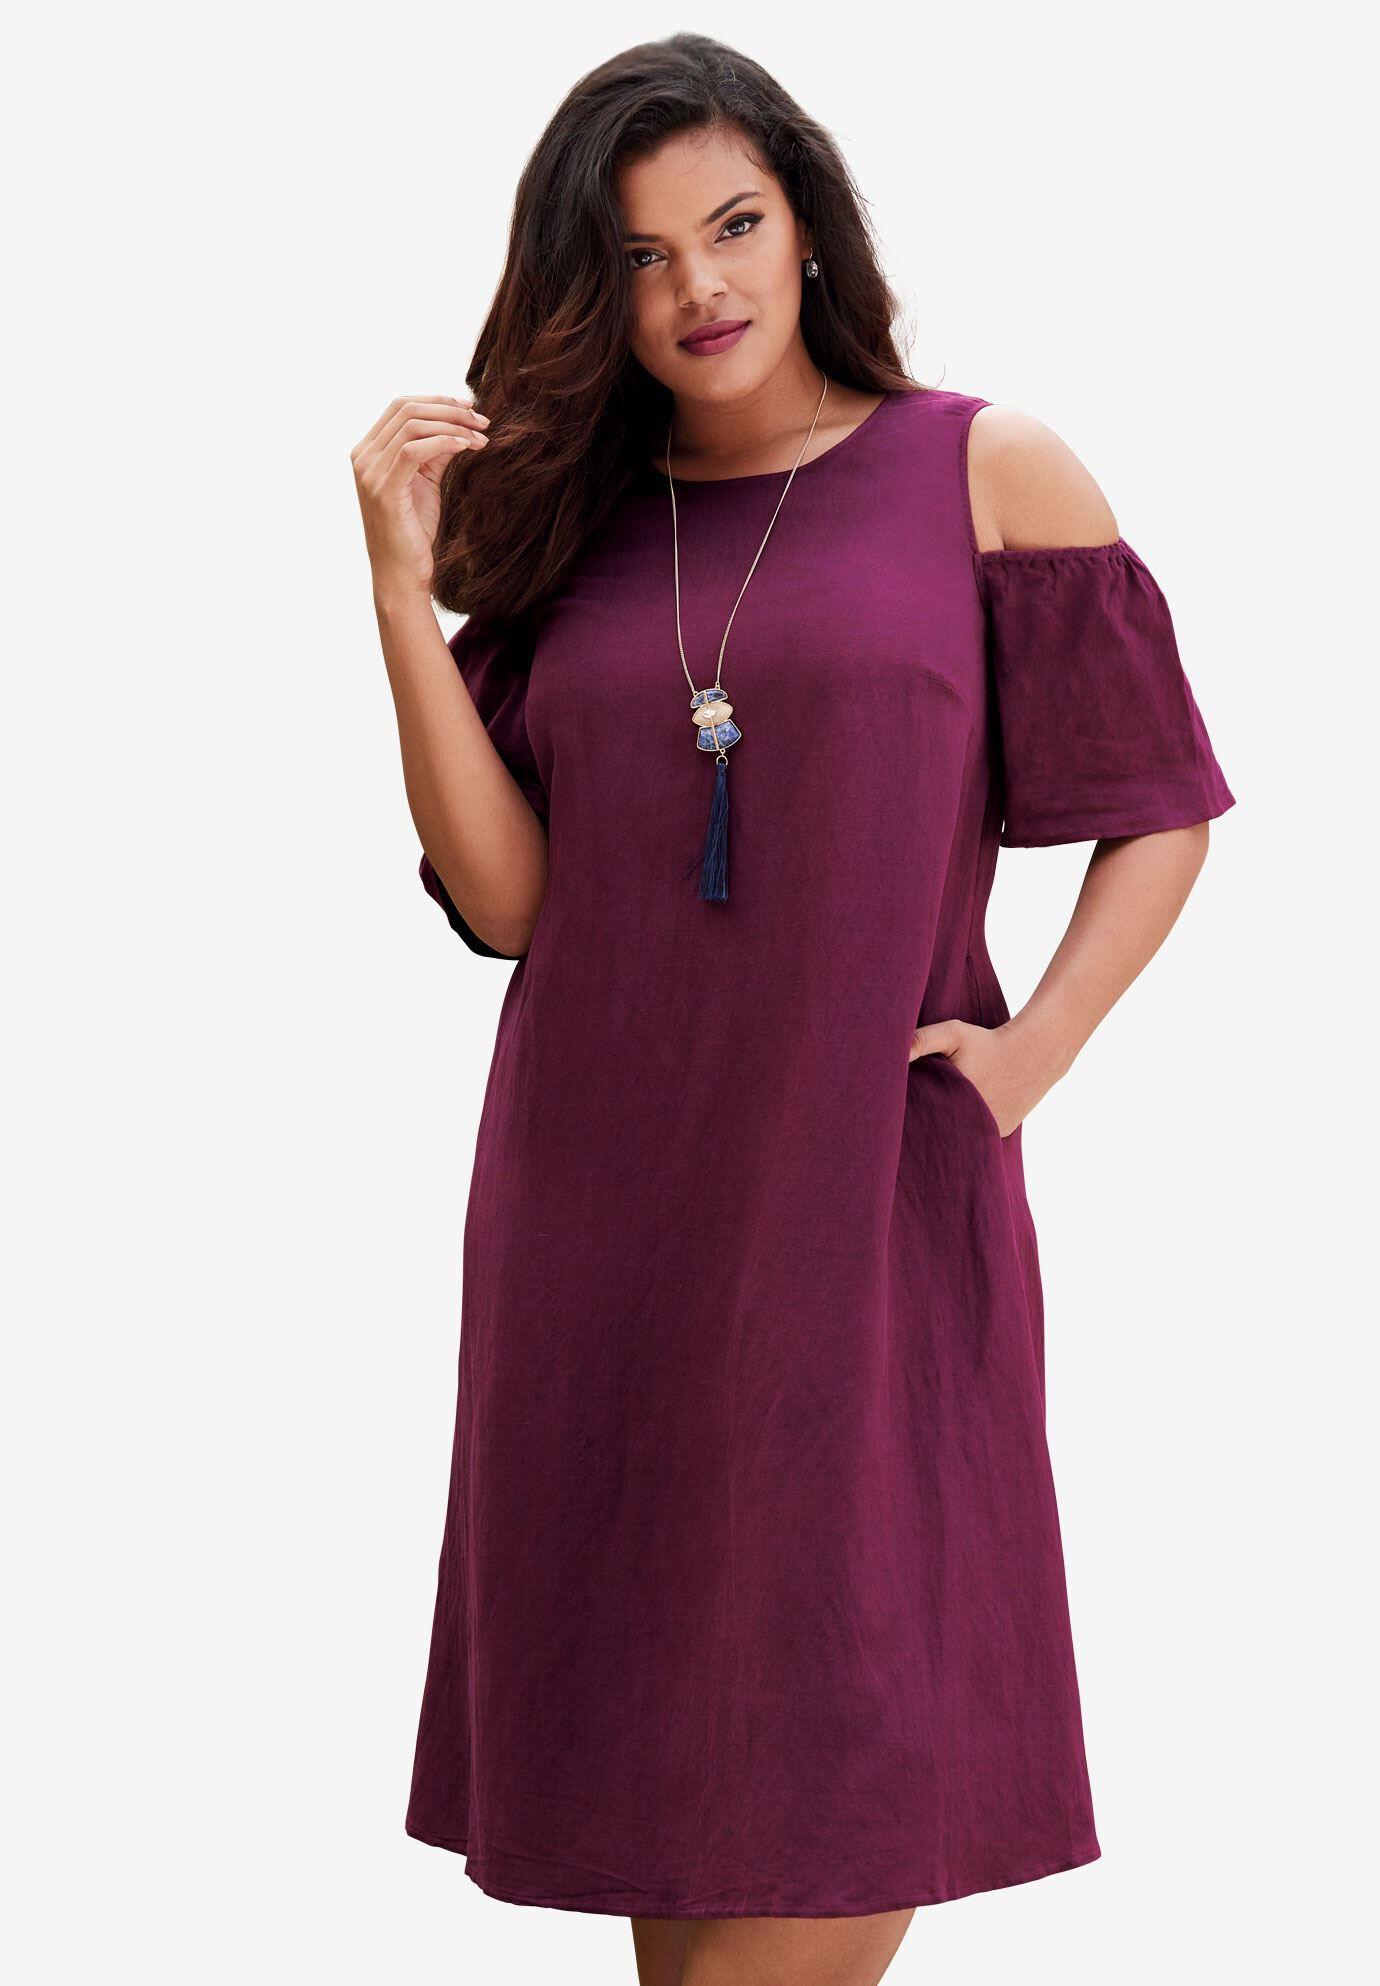 Church Dresses for Less